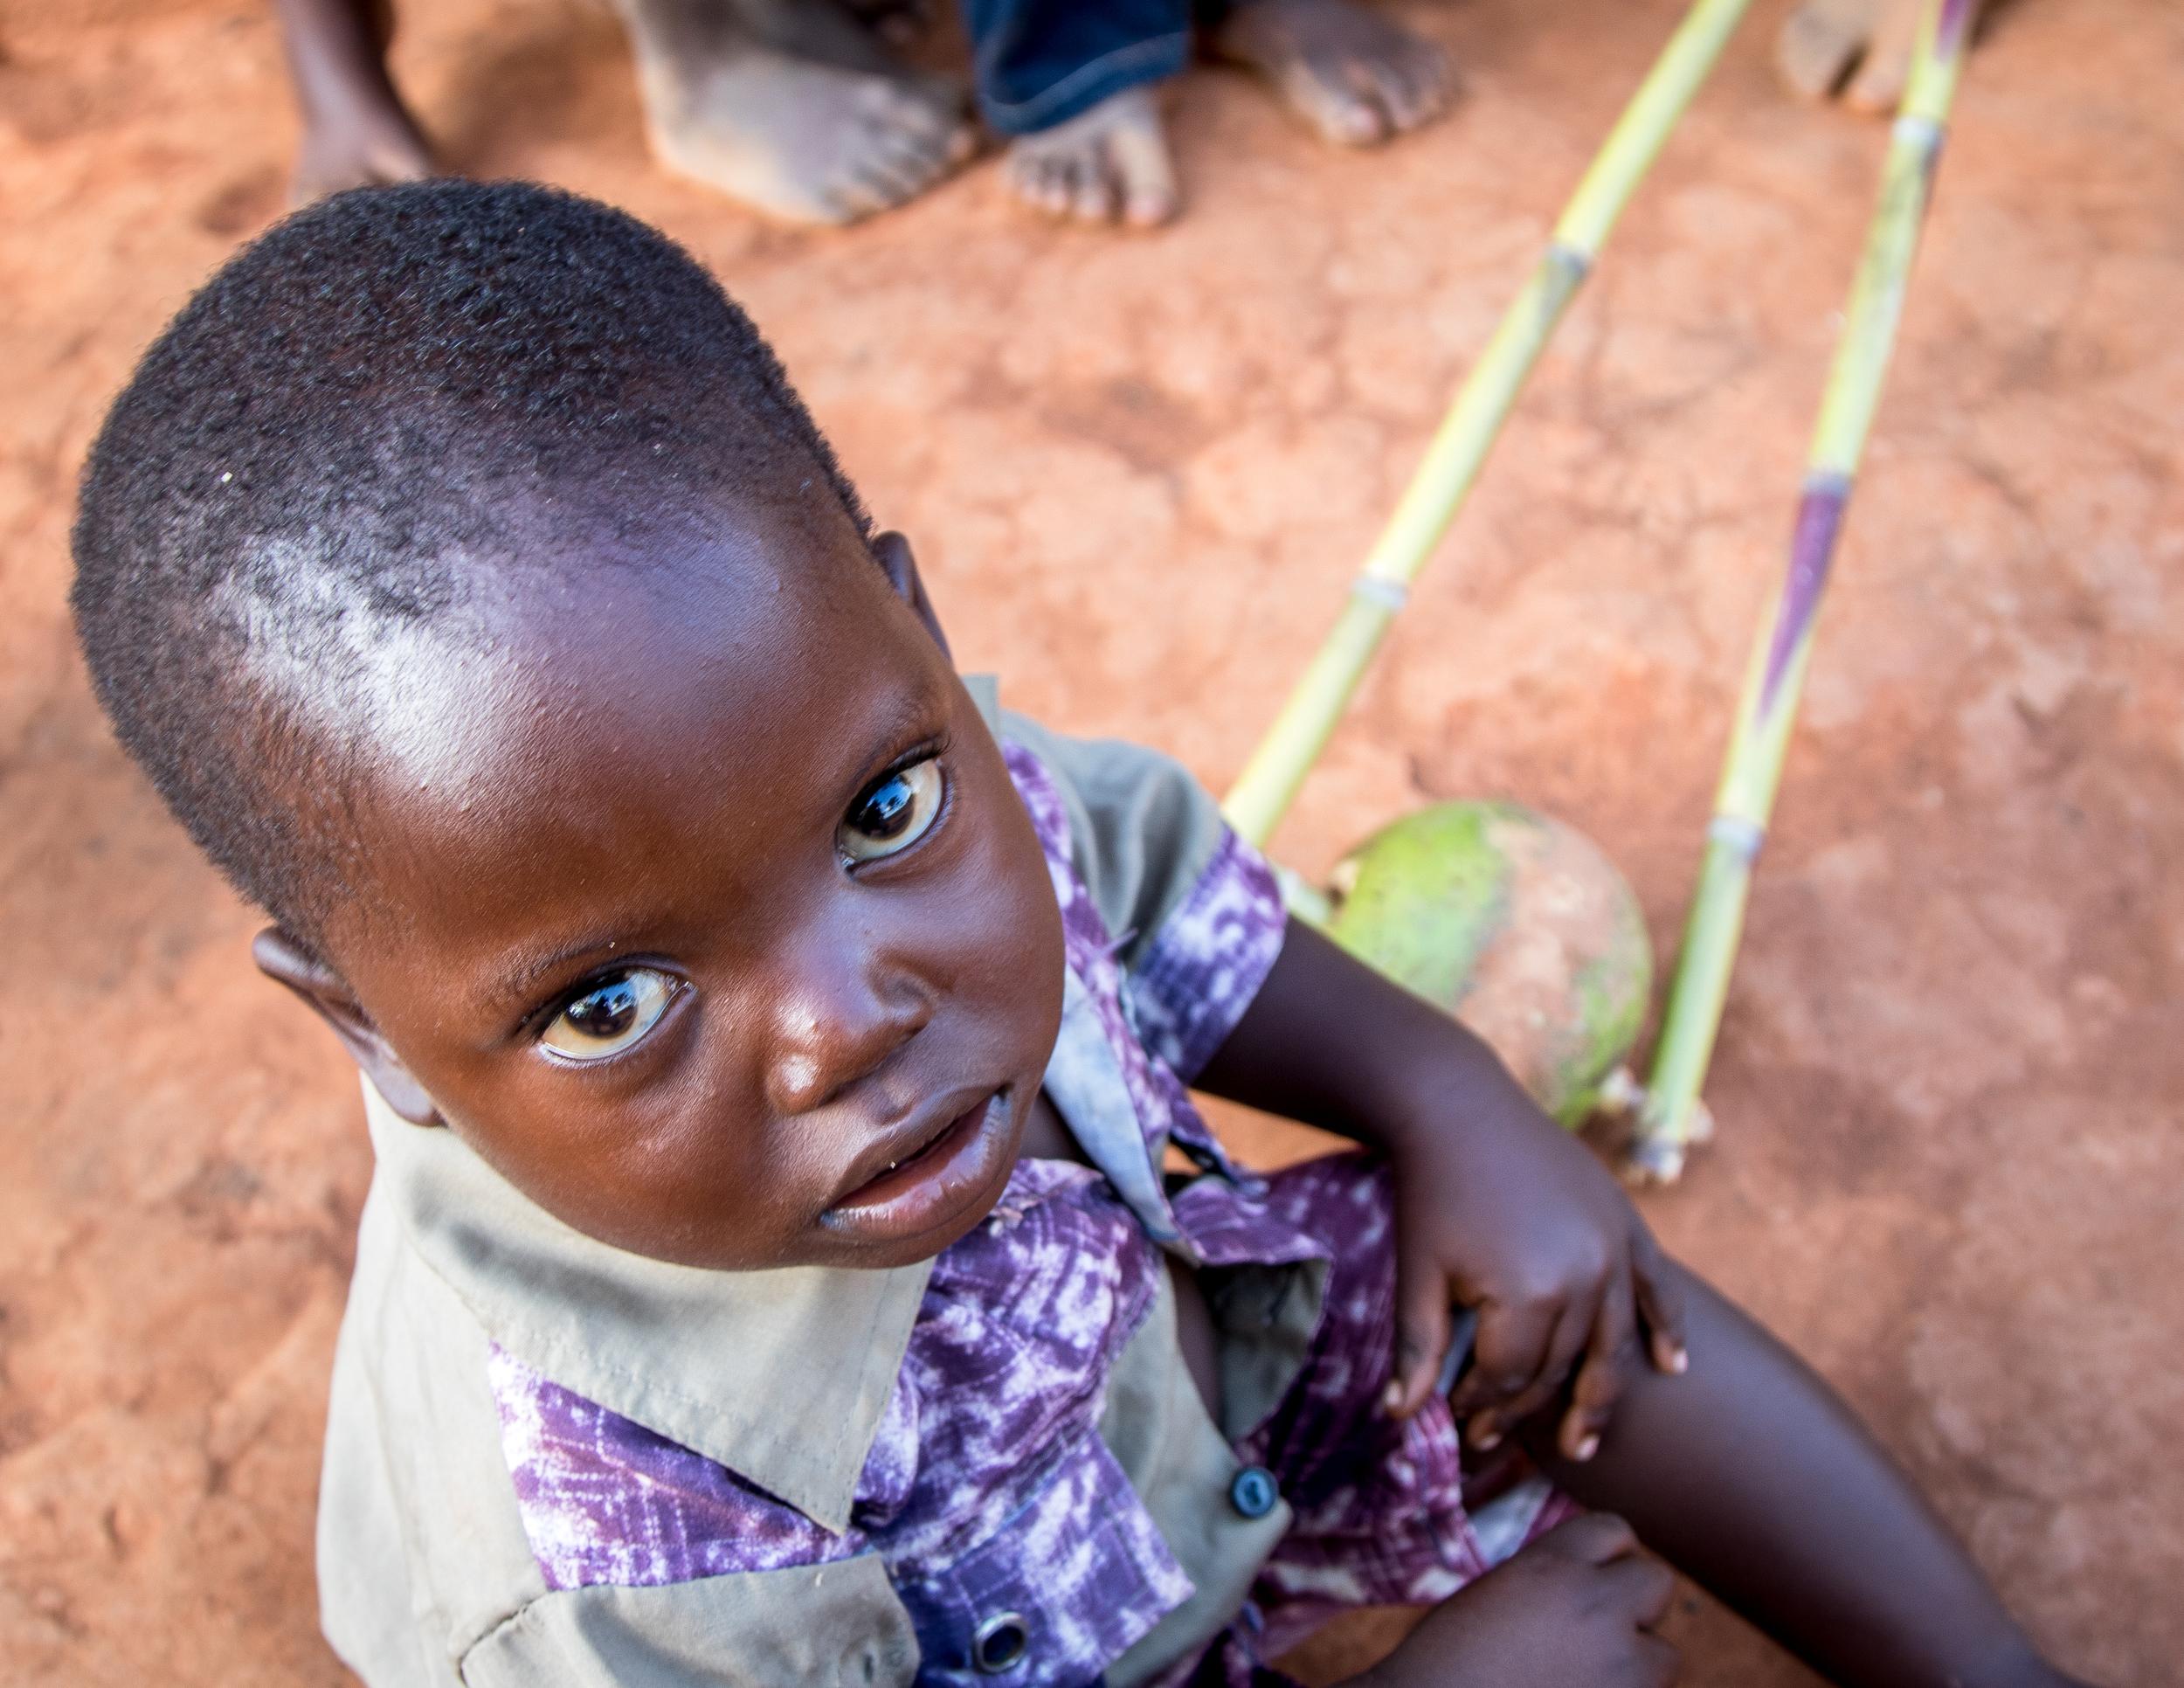 Adam Dickens Photography Malawi 2015 - 5009.jpg